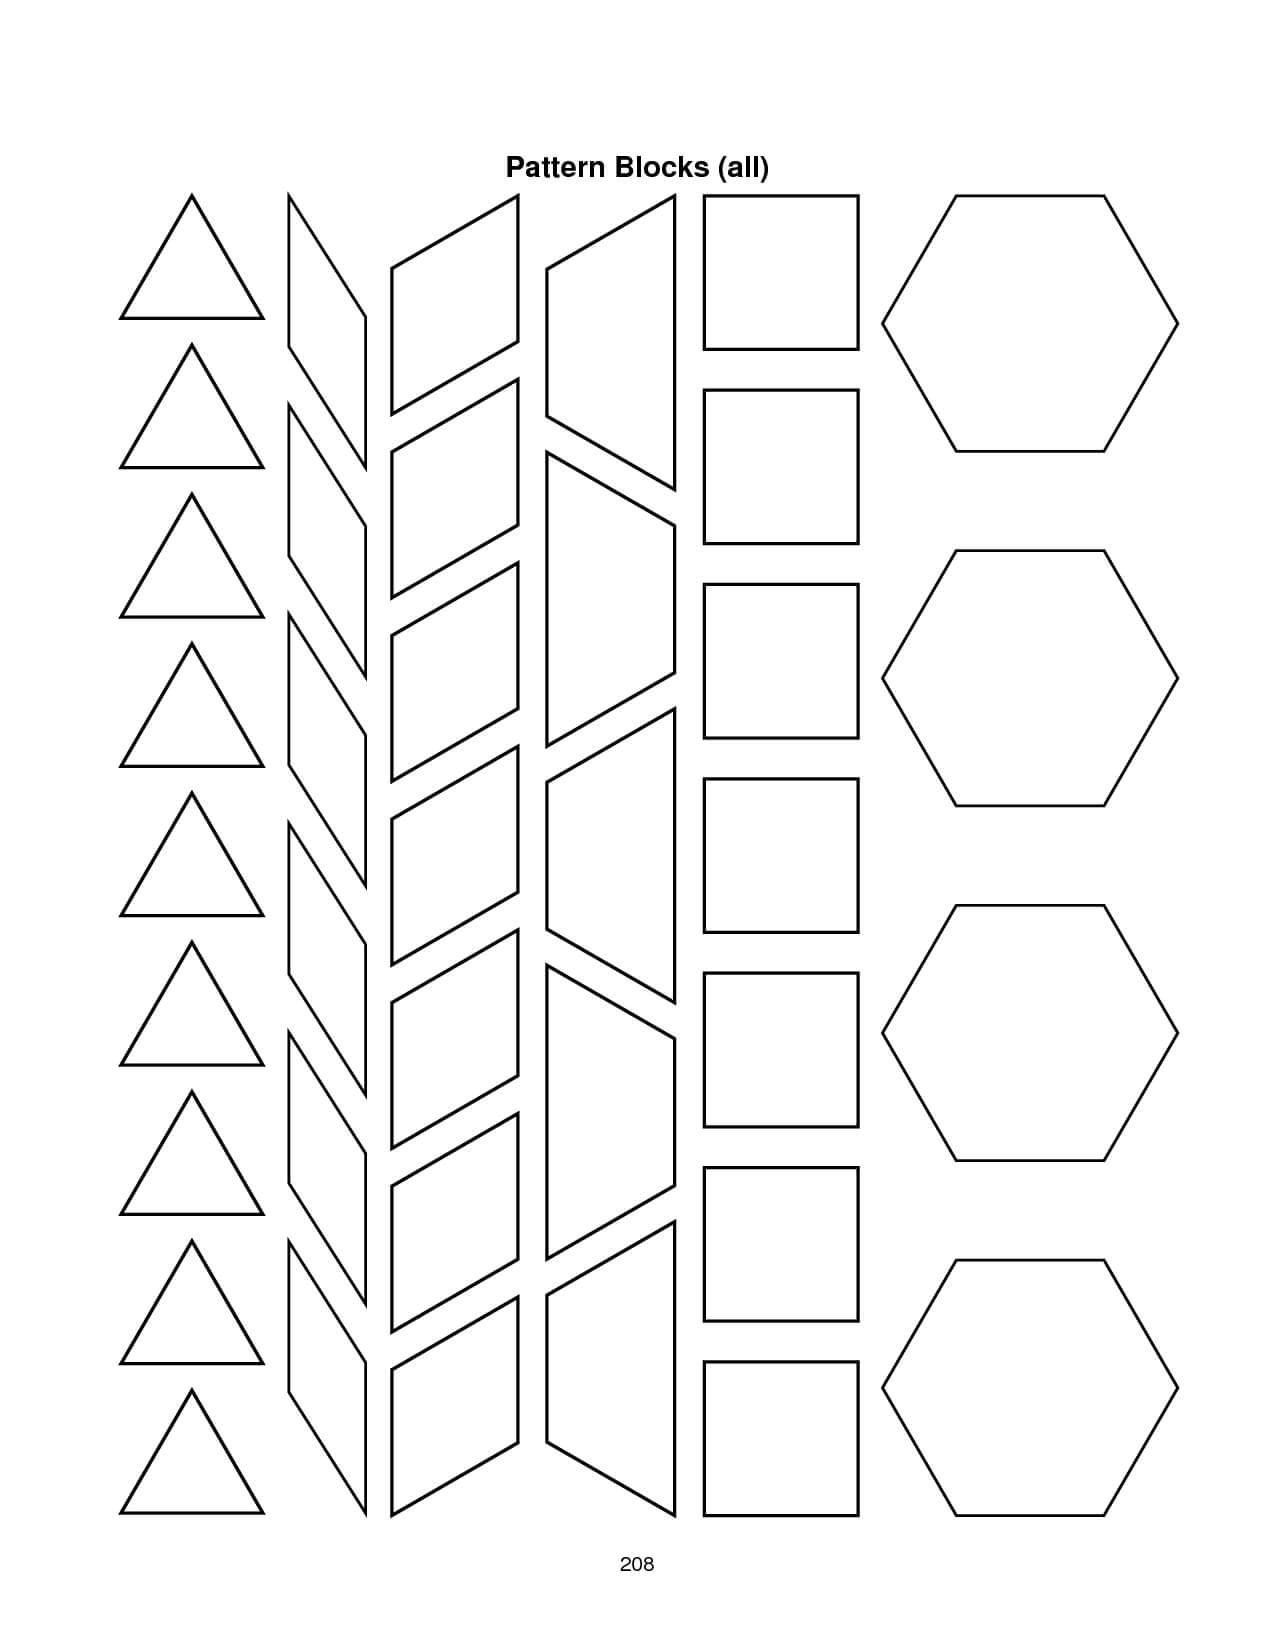 28 Images Of Blank Alphabet Pattern Block Template | Migapps Within Blank Pattern Block Templates